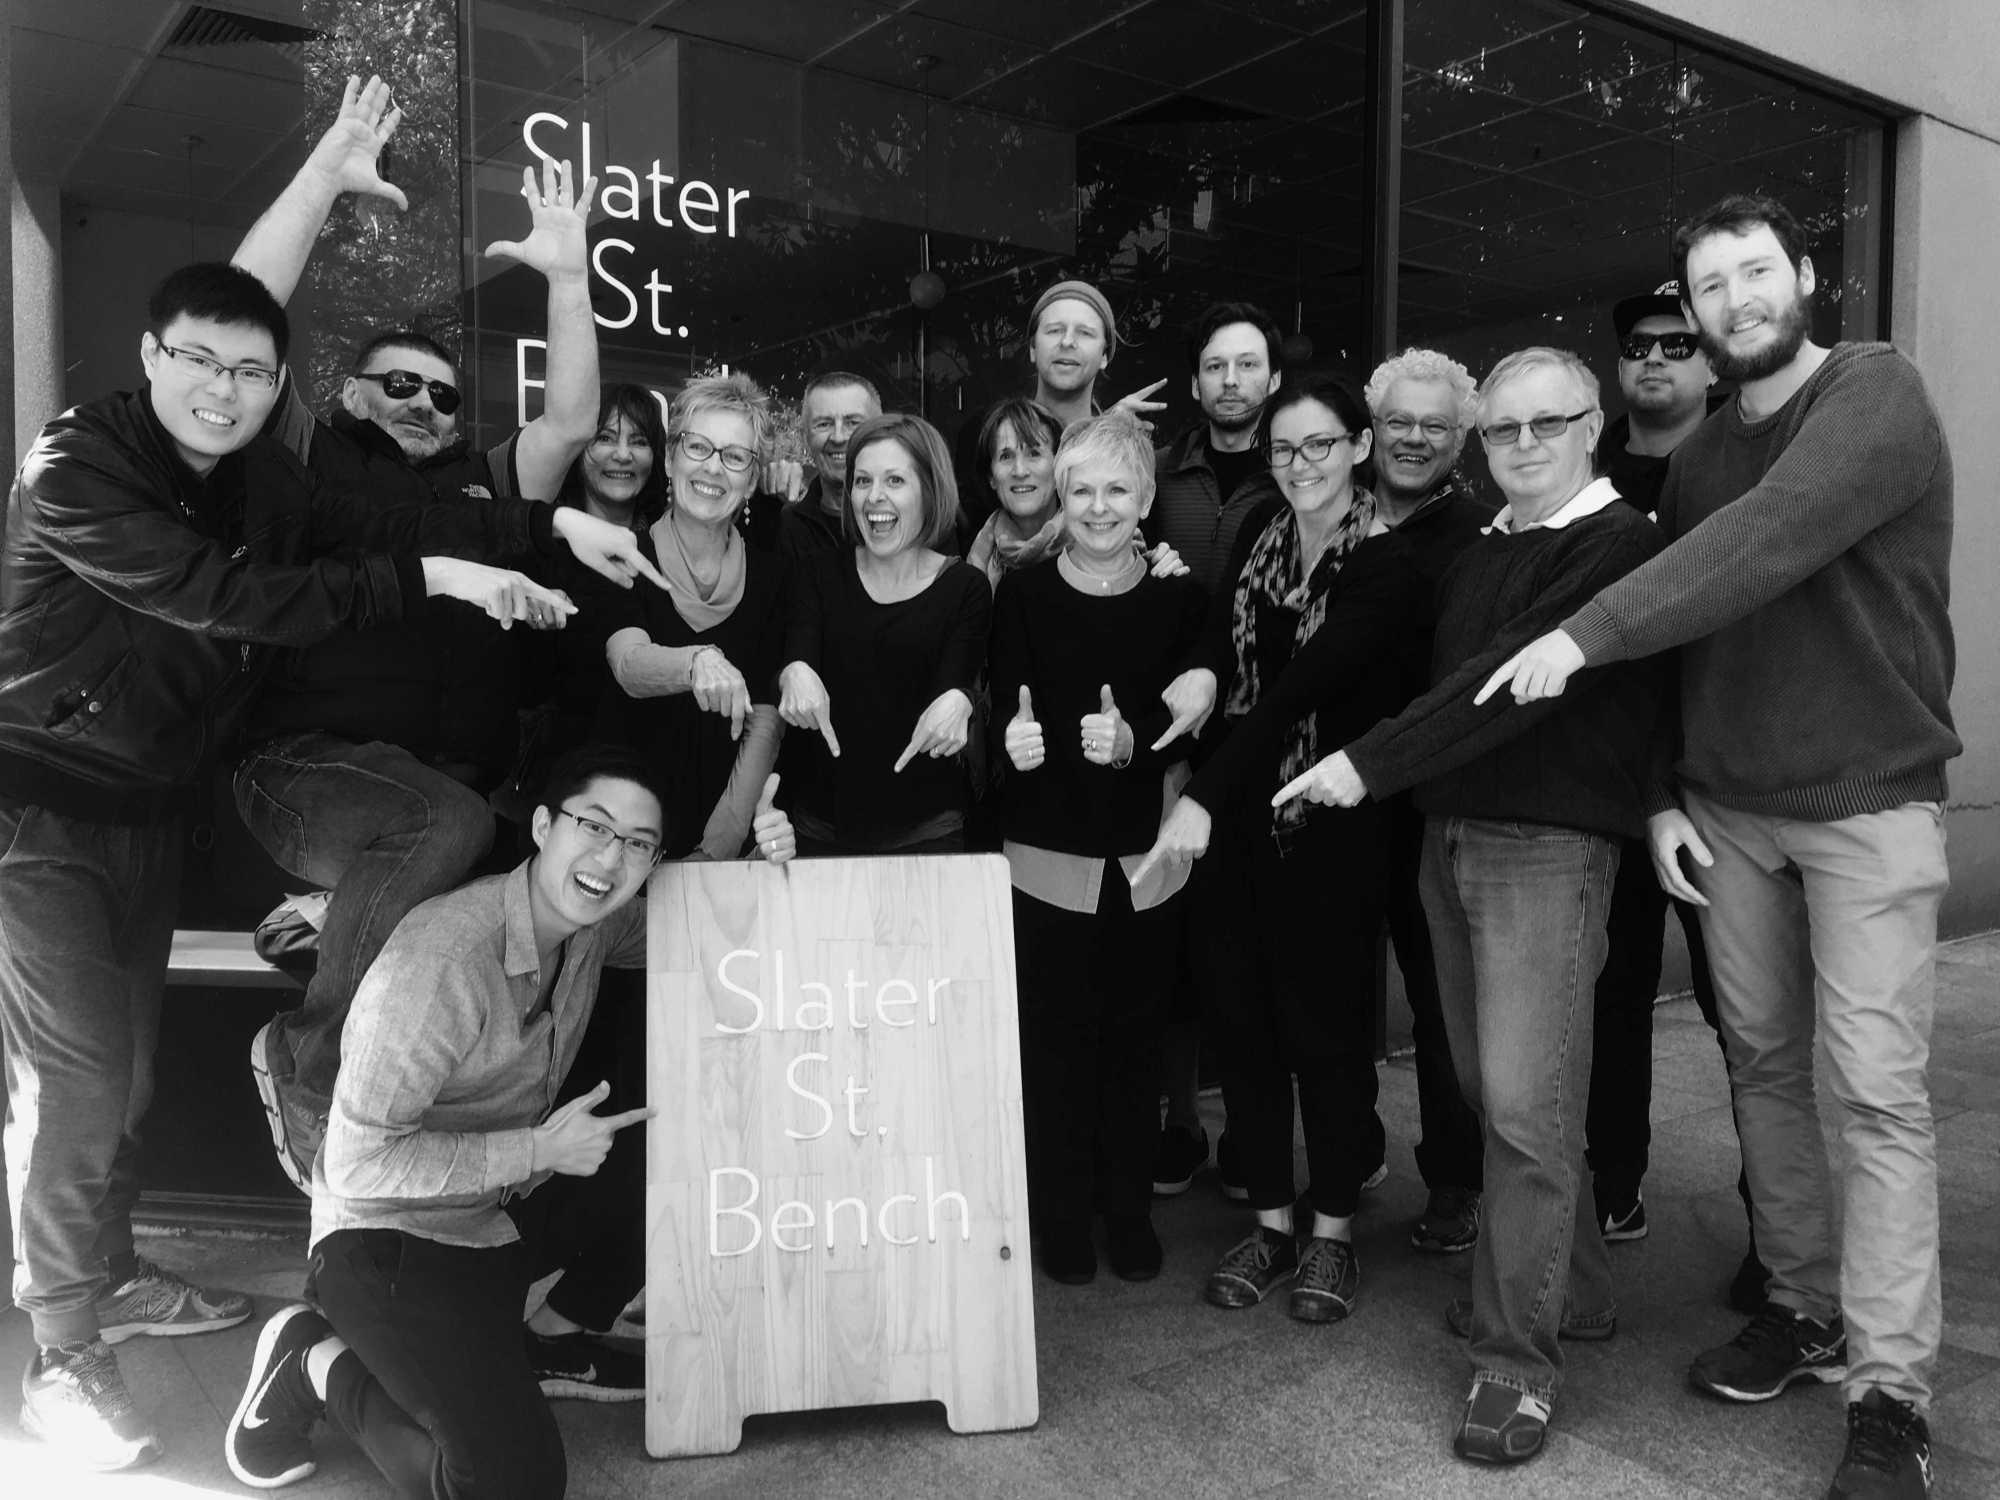 Student Photos: Melbourne Conquer Your Fears Workshop 2016